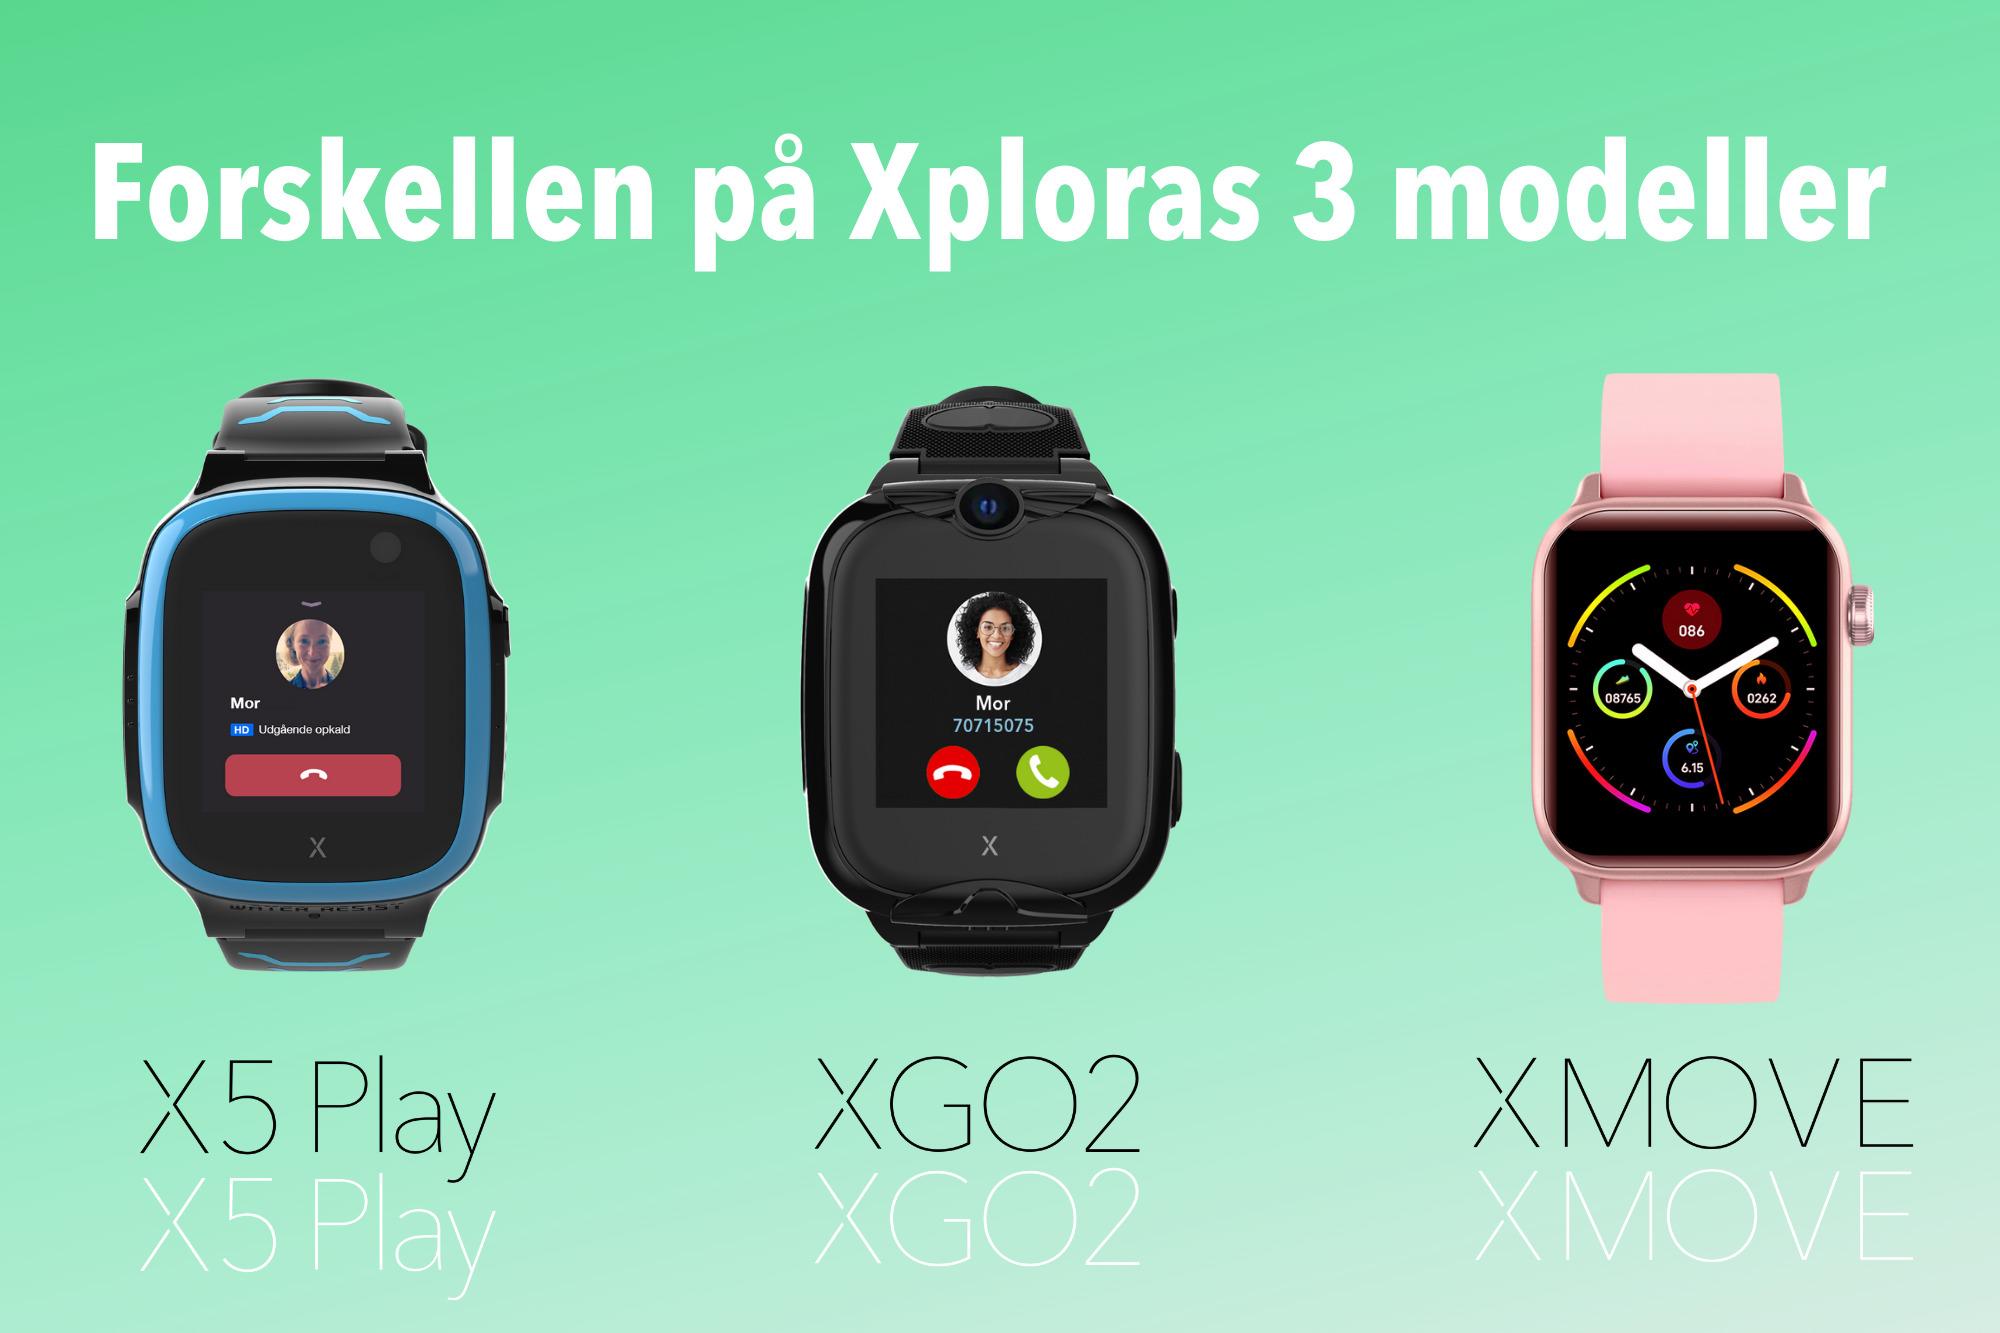 forskellen på xploras 3 modeller